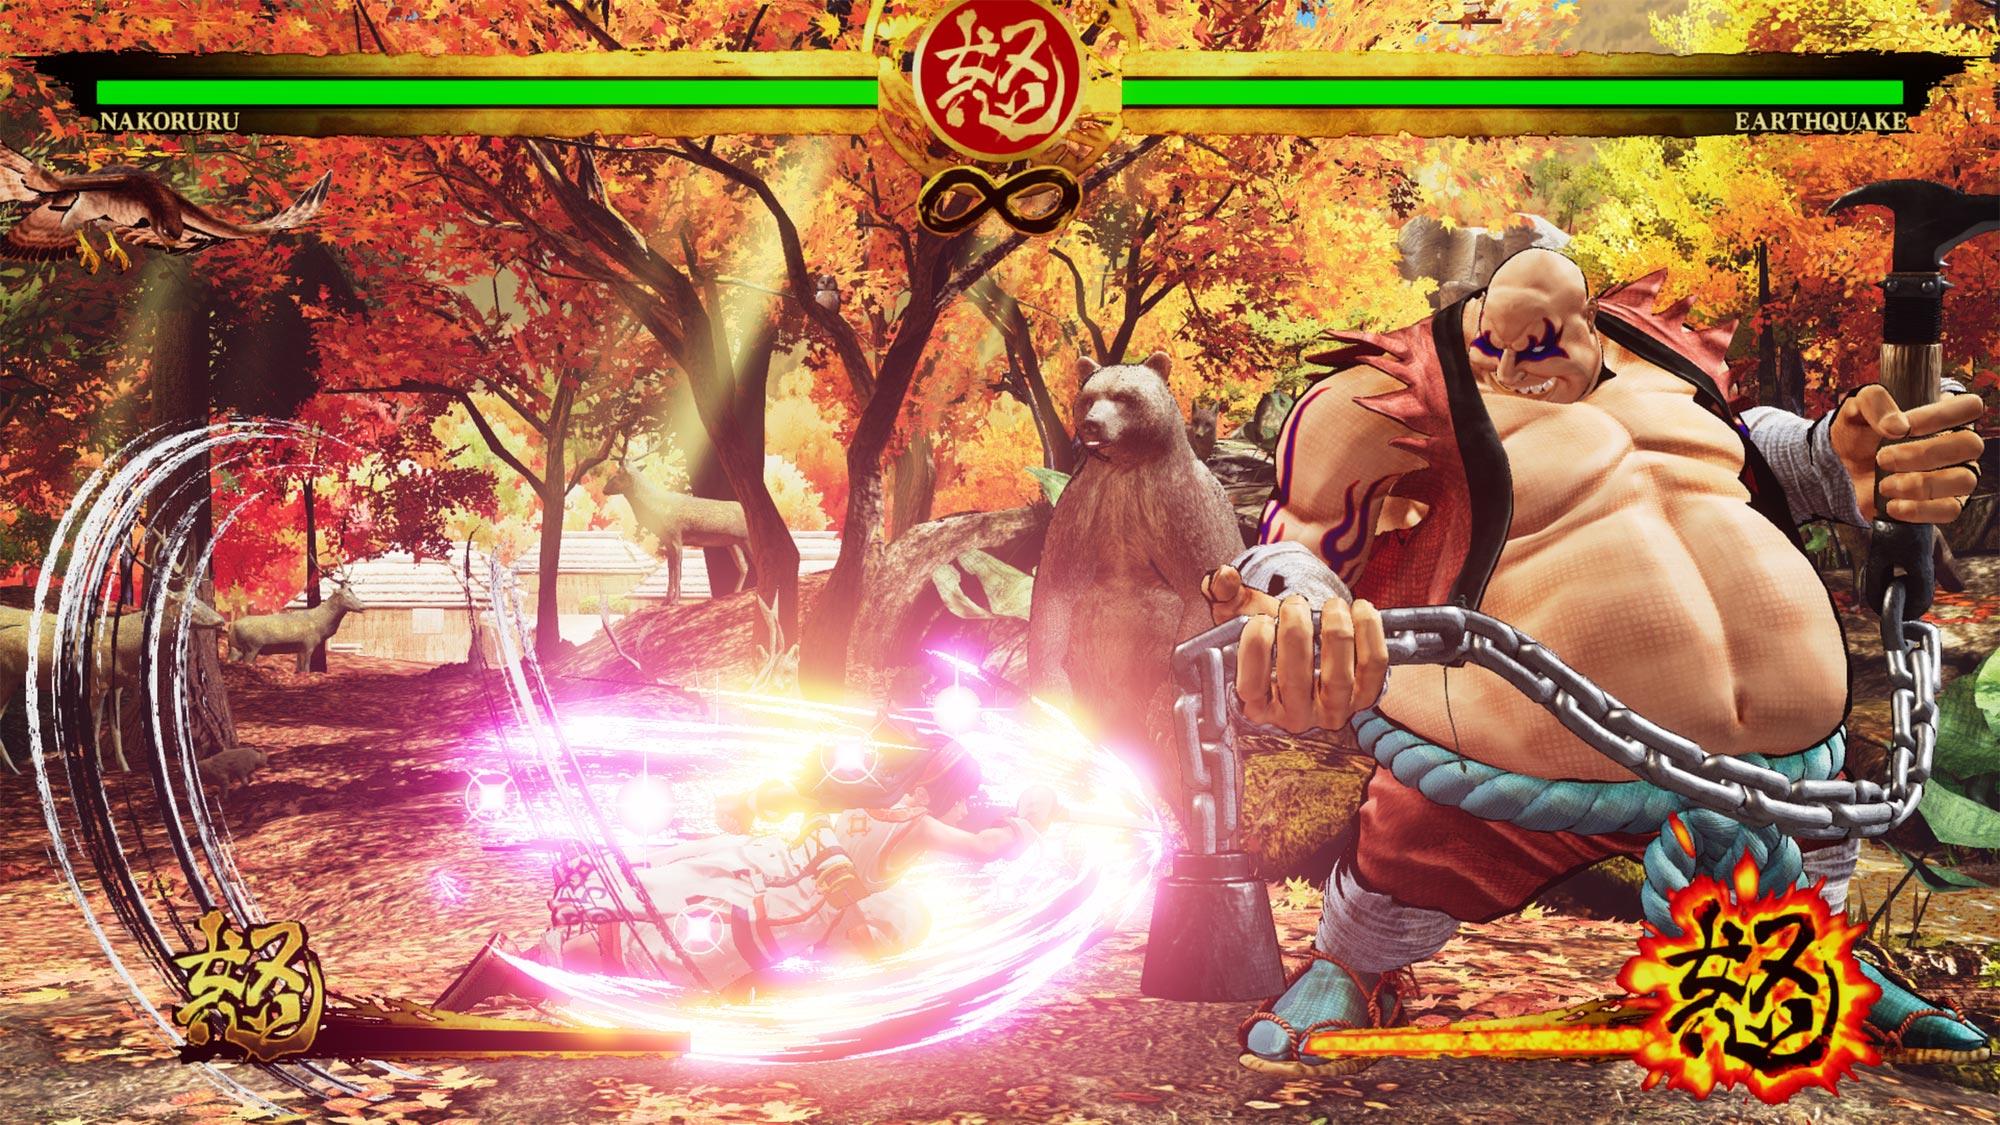 Samurai Shodown screenshots 6 out of 11 image gallery